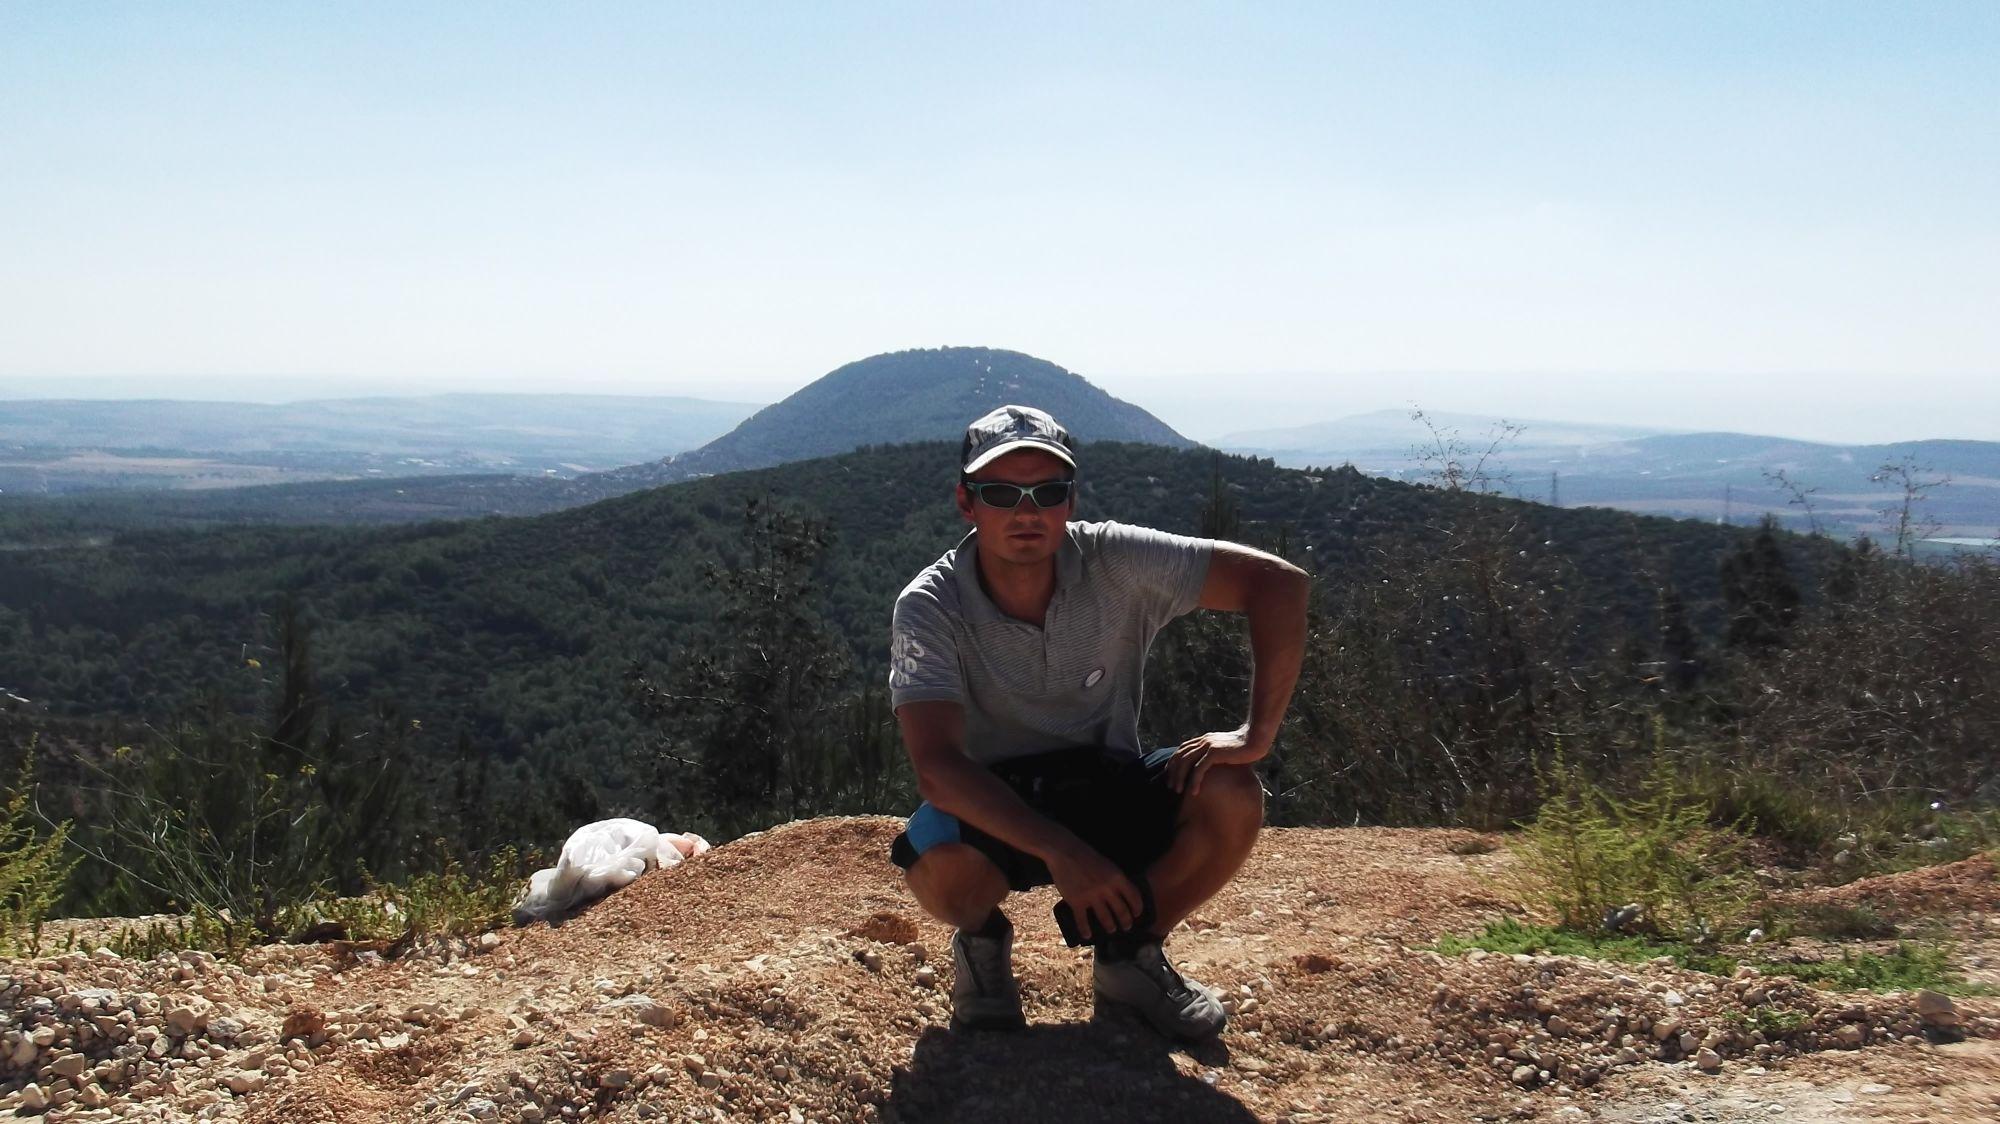 Izrael - Góra Tabor - zdjęcia, atrakcje